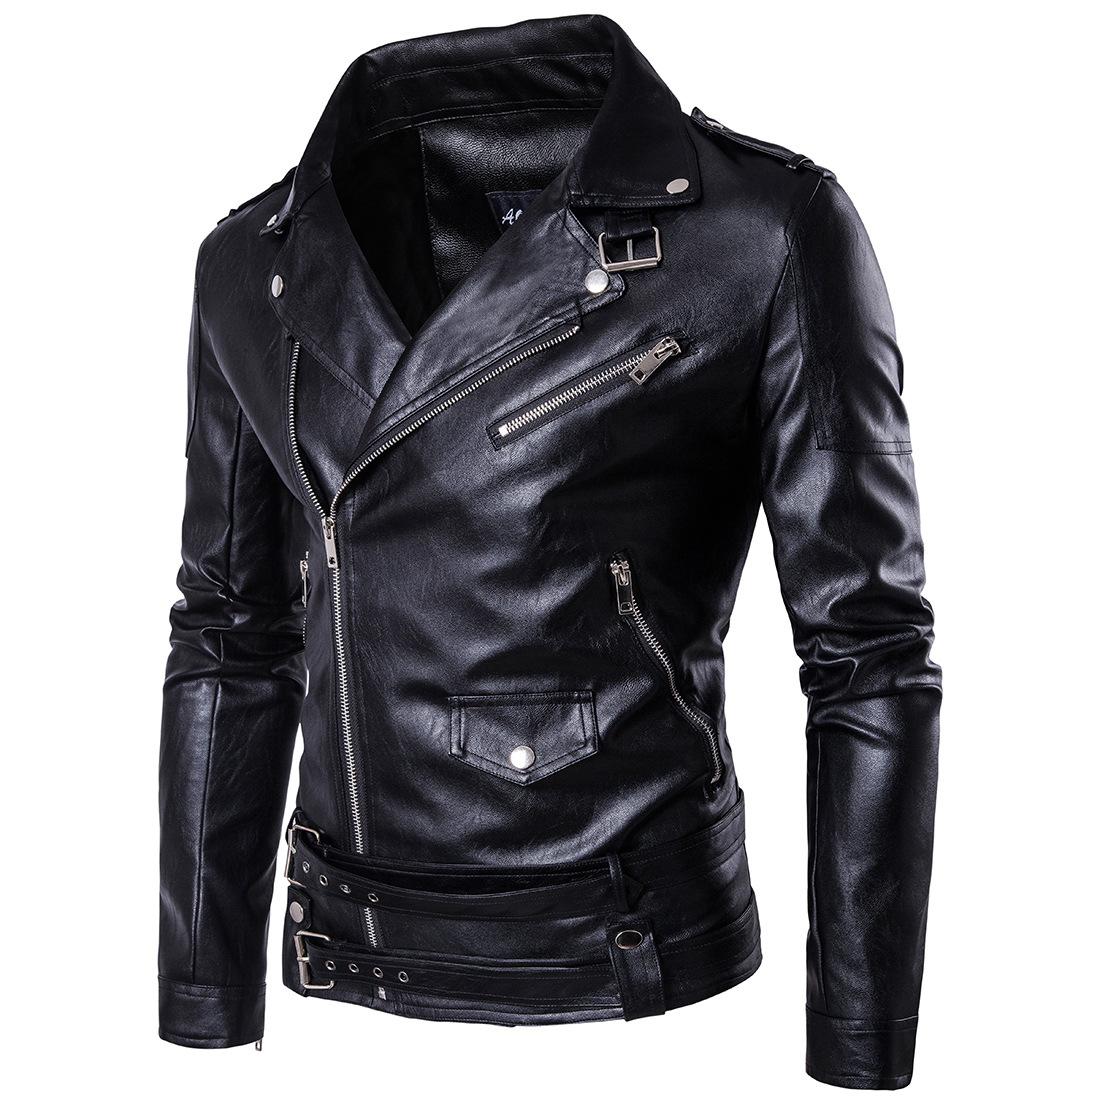 Amazon wise new men's locomotive leather jacket men's large multi zip leather coat European Pu casual coat